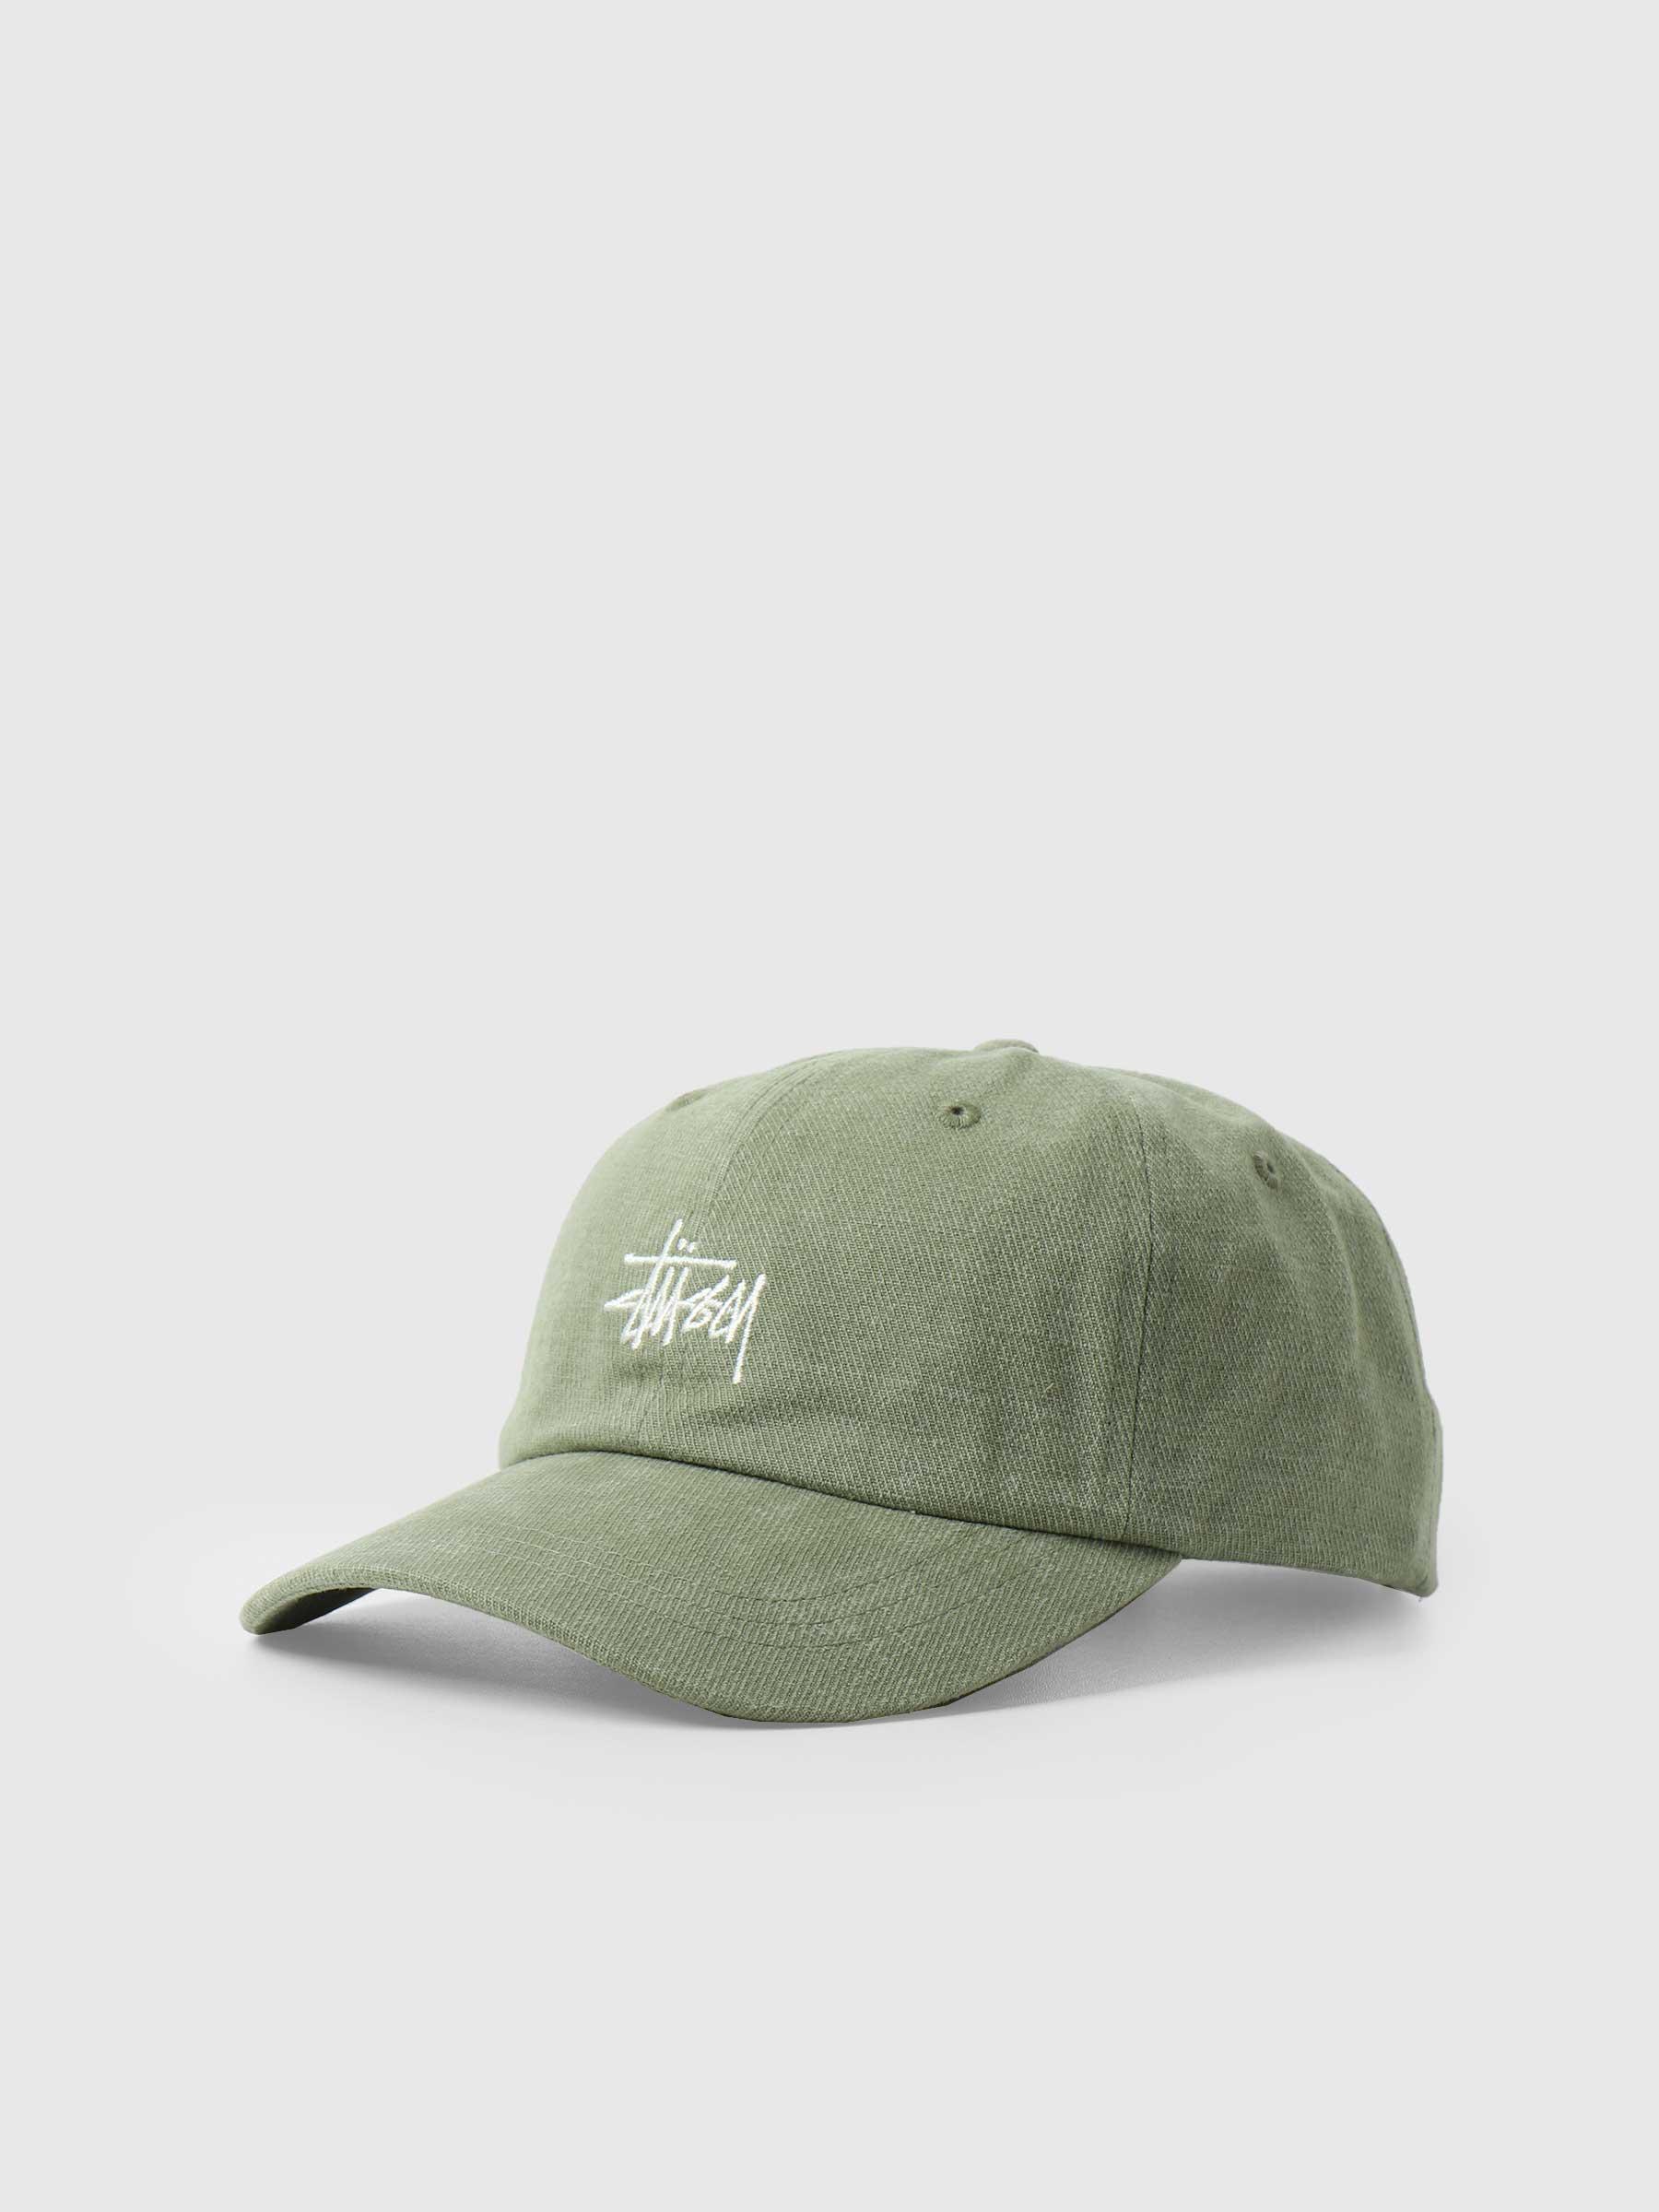 Stock Low Pro Cap Light Olive 1311012